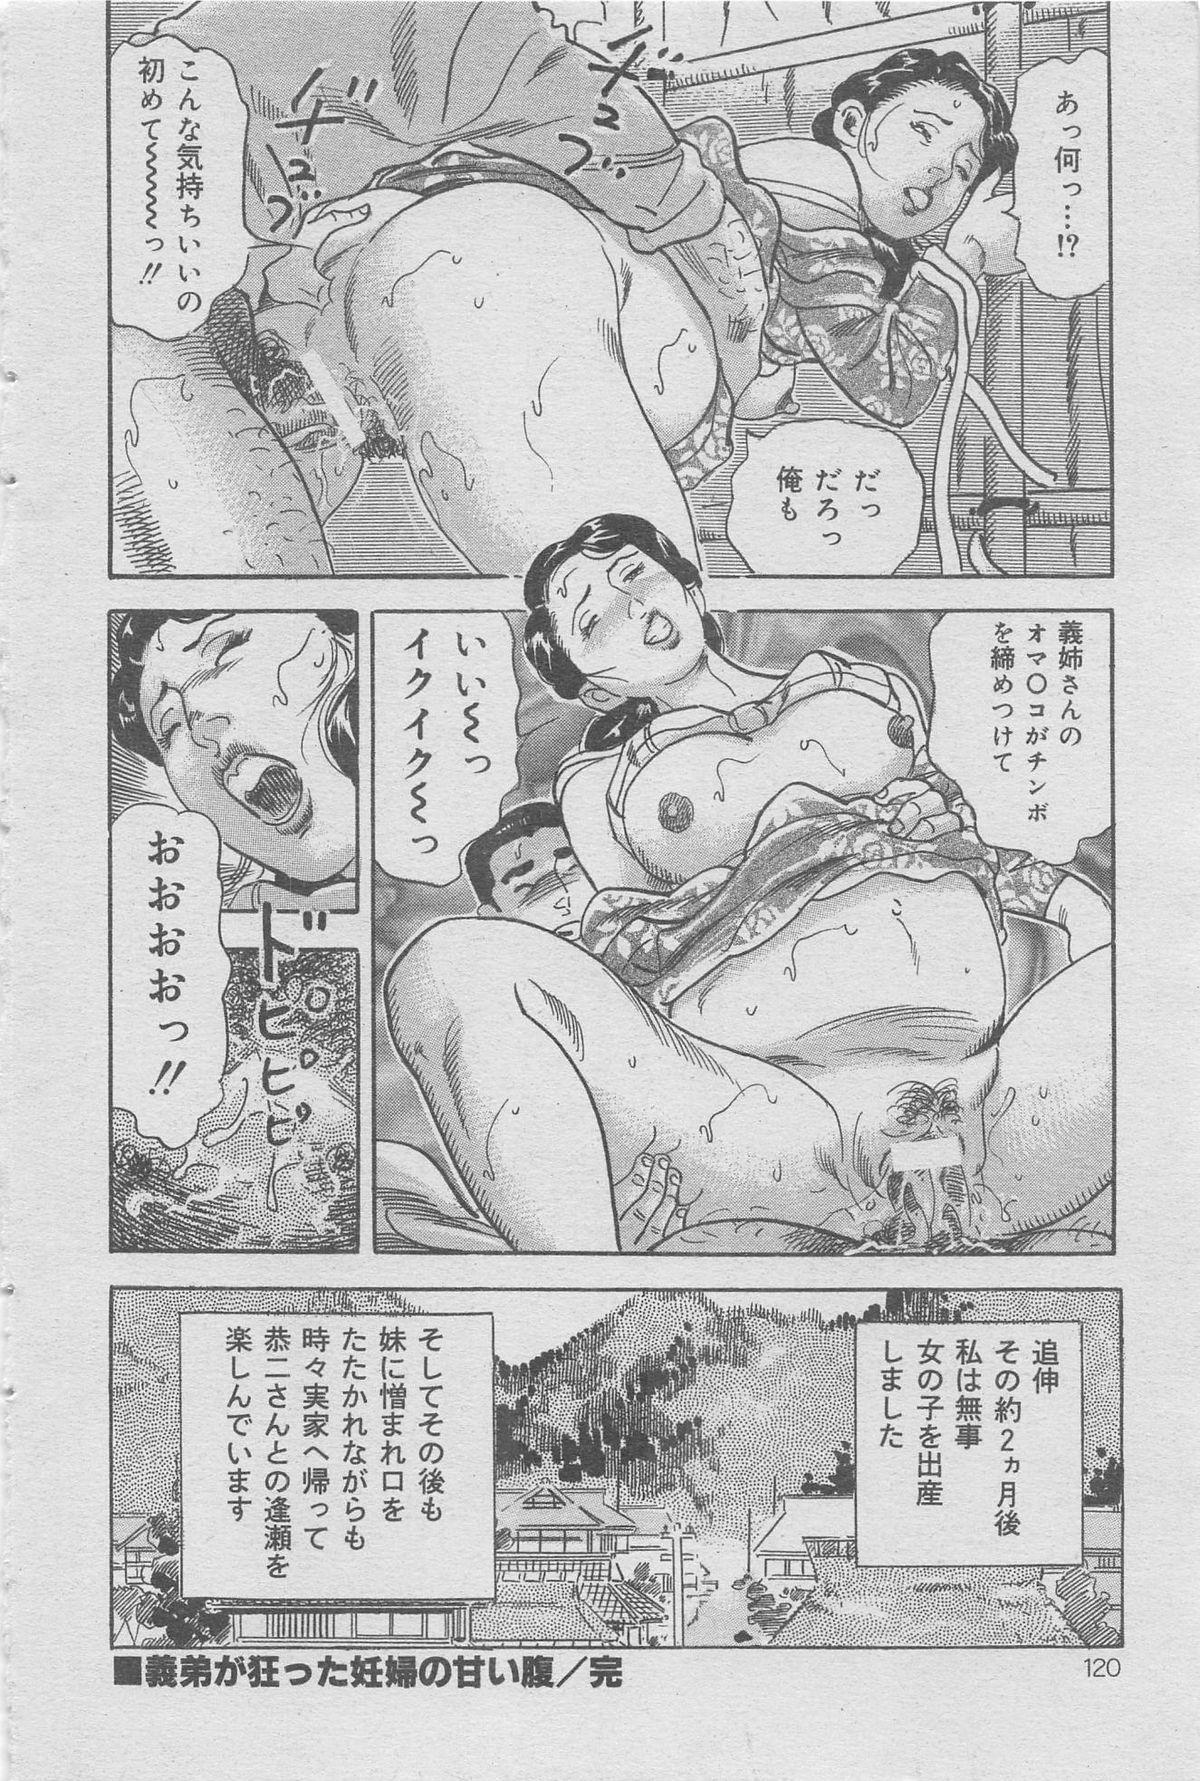 Hontou ni Atta Kindanai vol.7 95